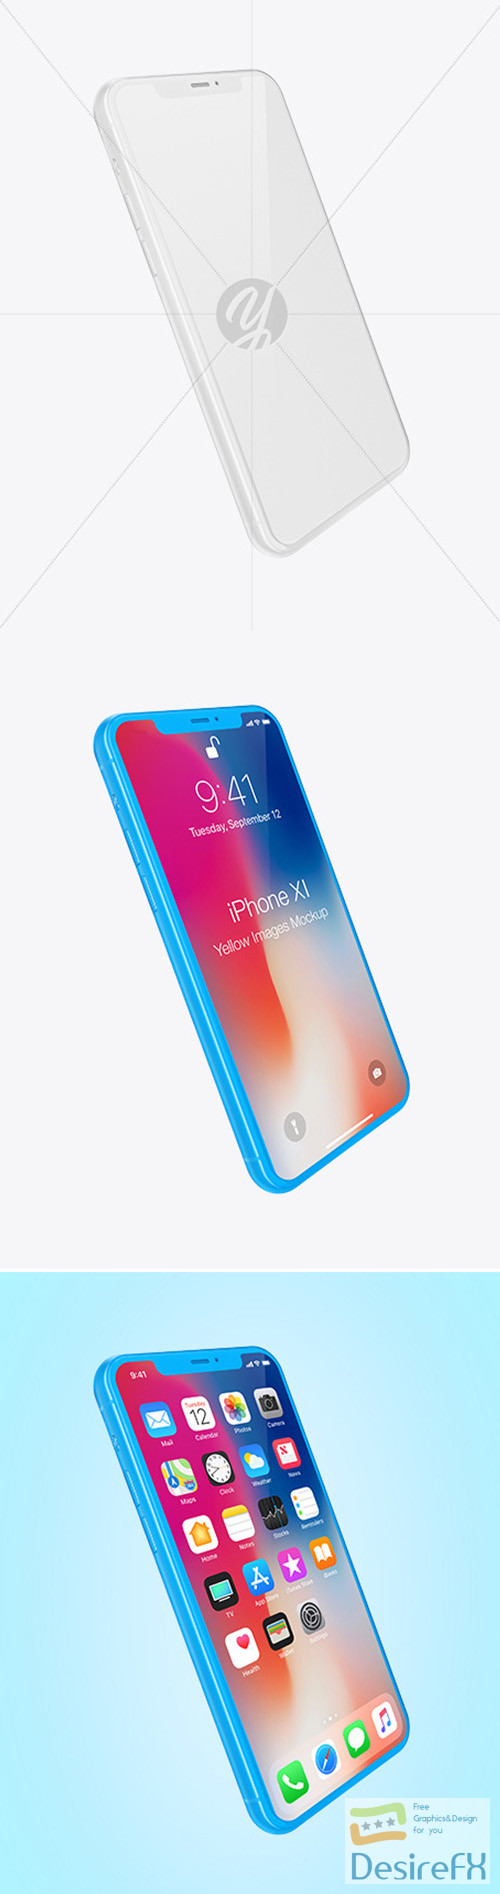 mock-up - Clay Apple Iphone 11 Pro Mockup 52103 TIF